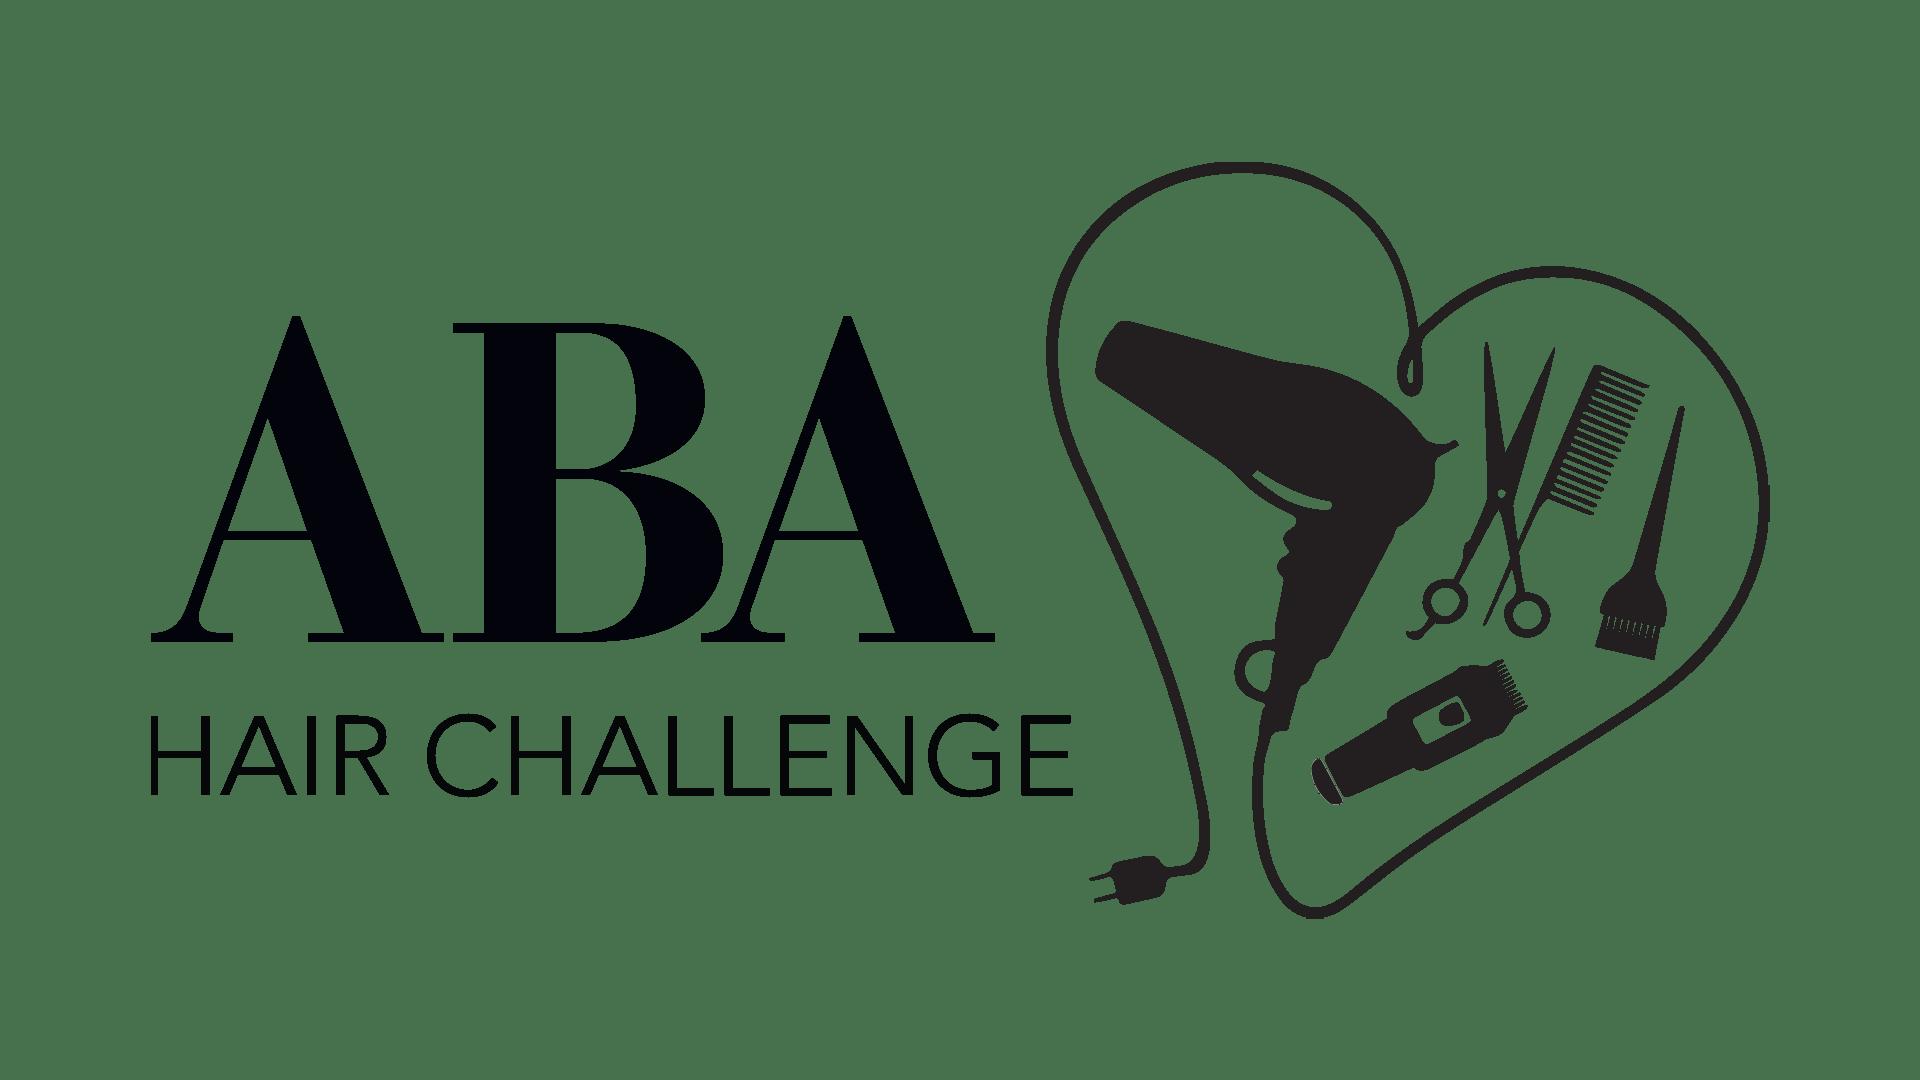 aba hair challenge logo